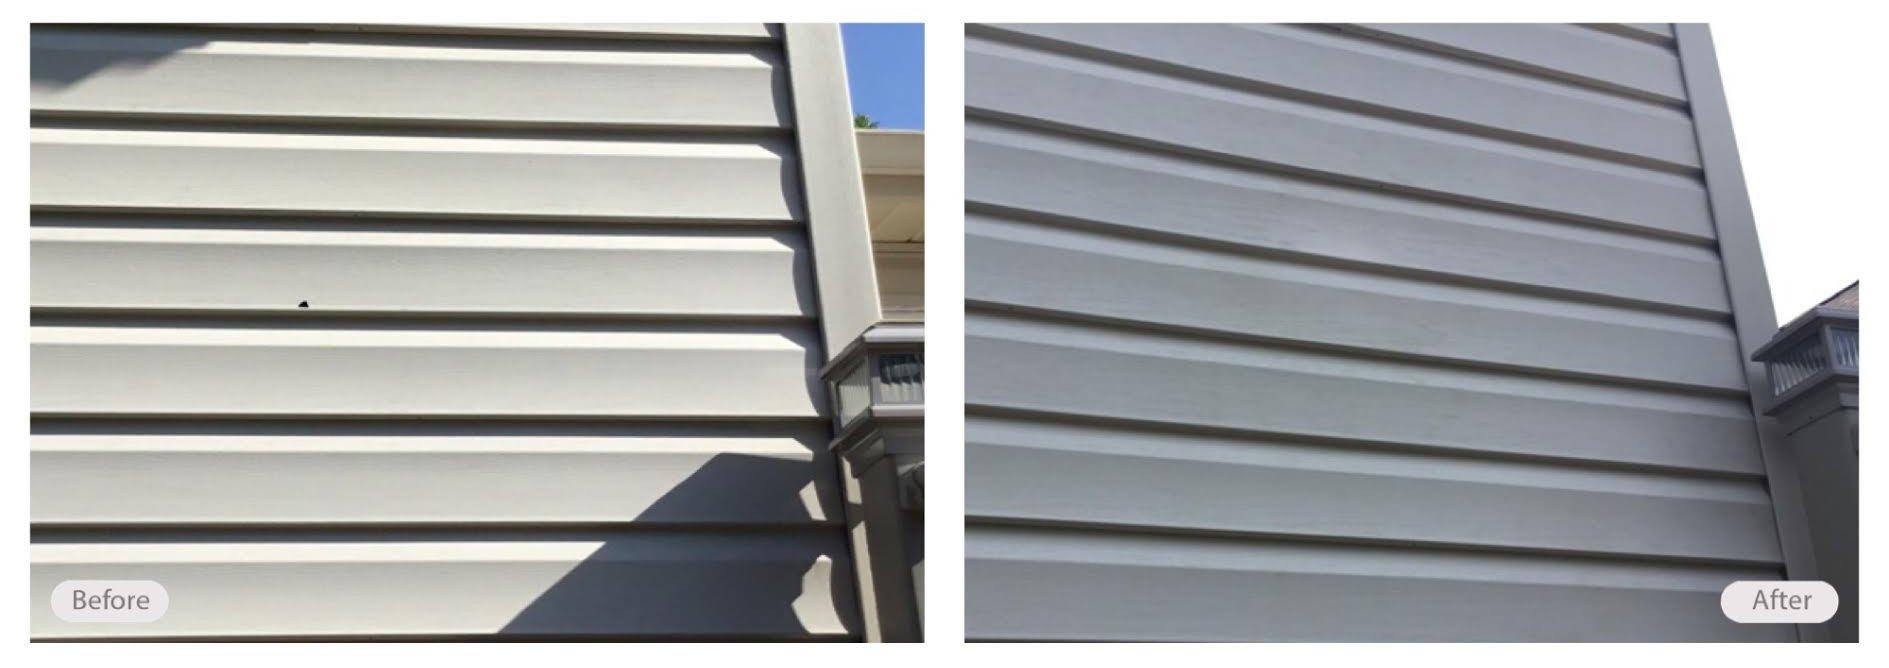 Vinyl siding damage repair and re-dye